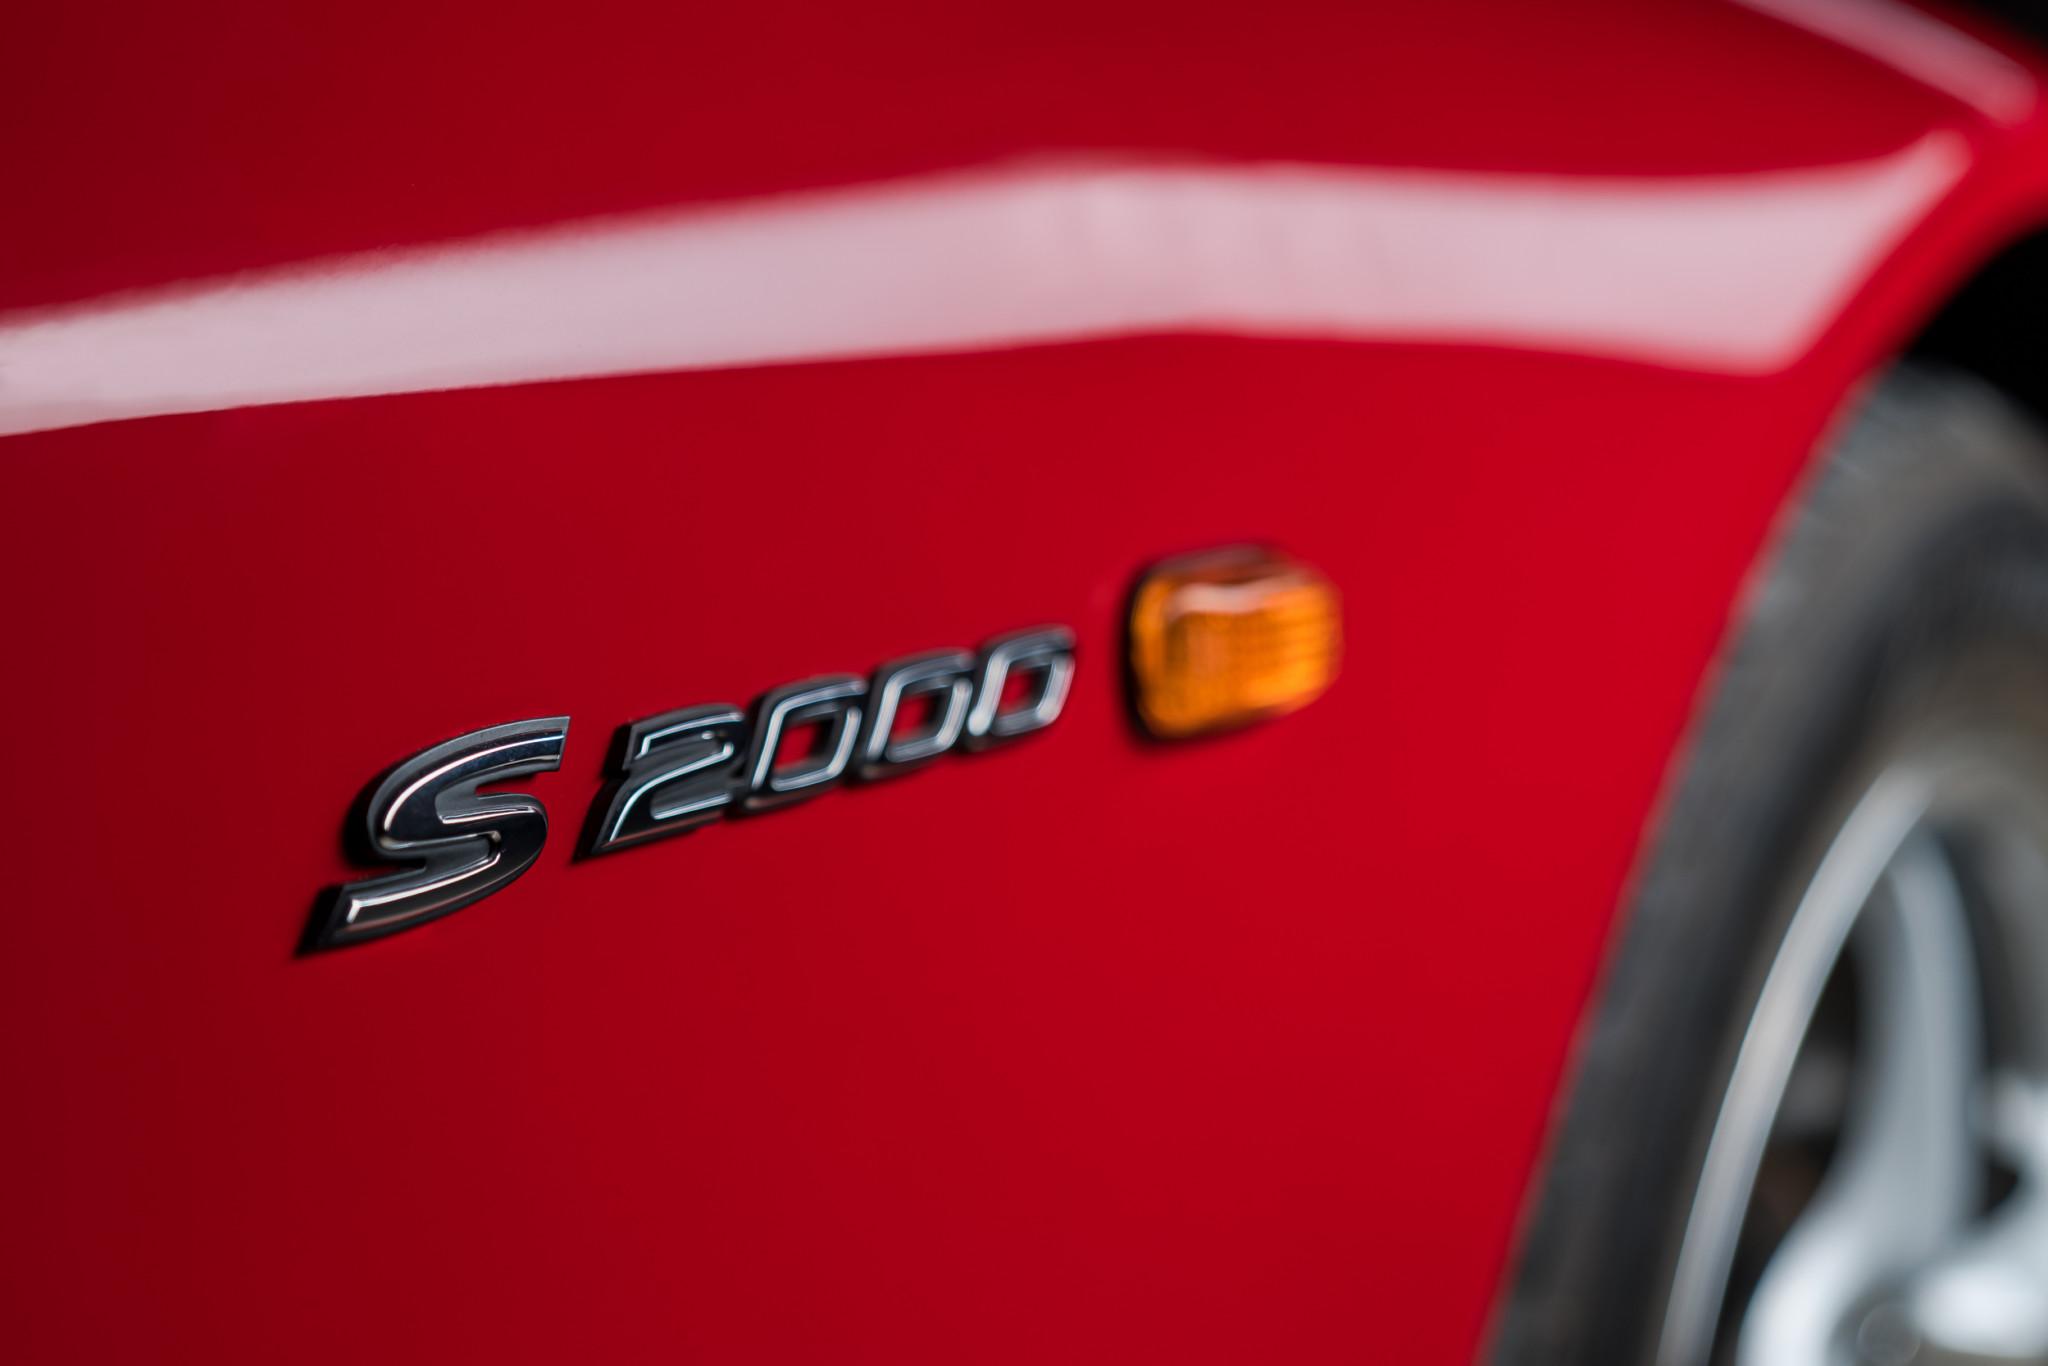 2000 Honda S2000 badge